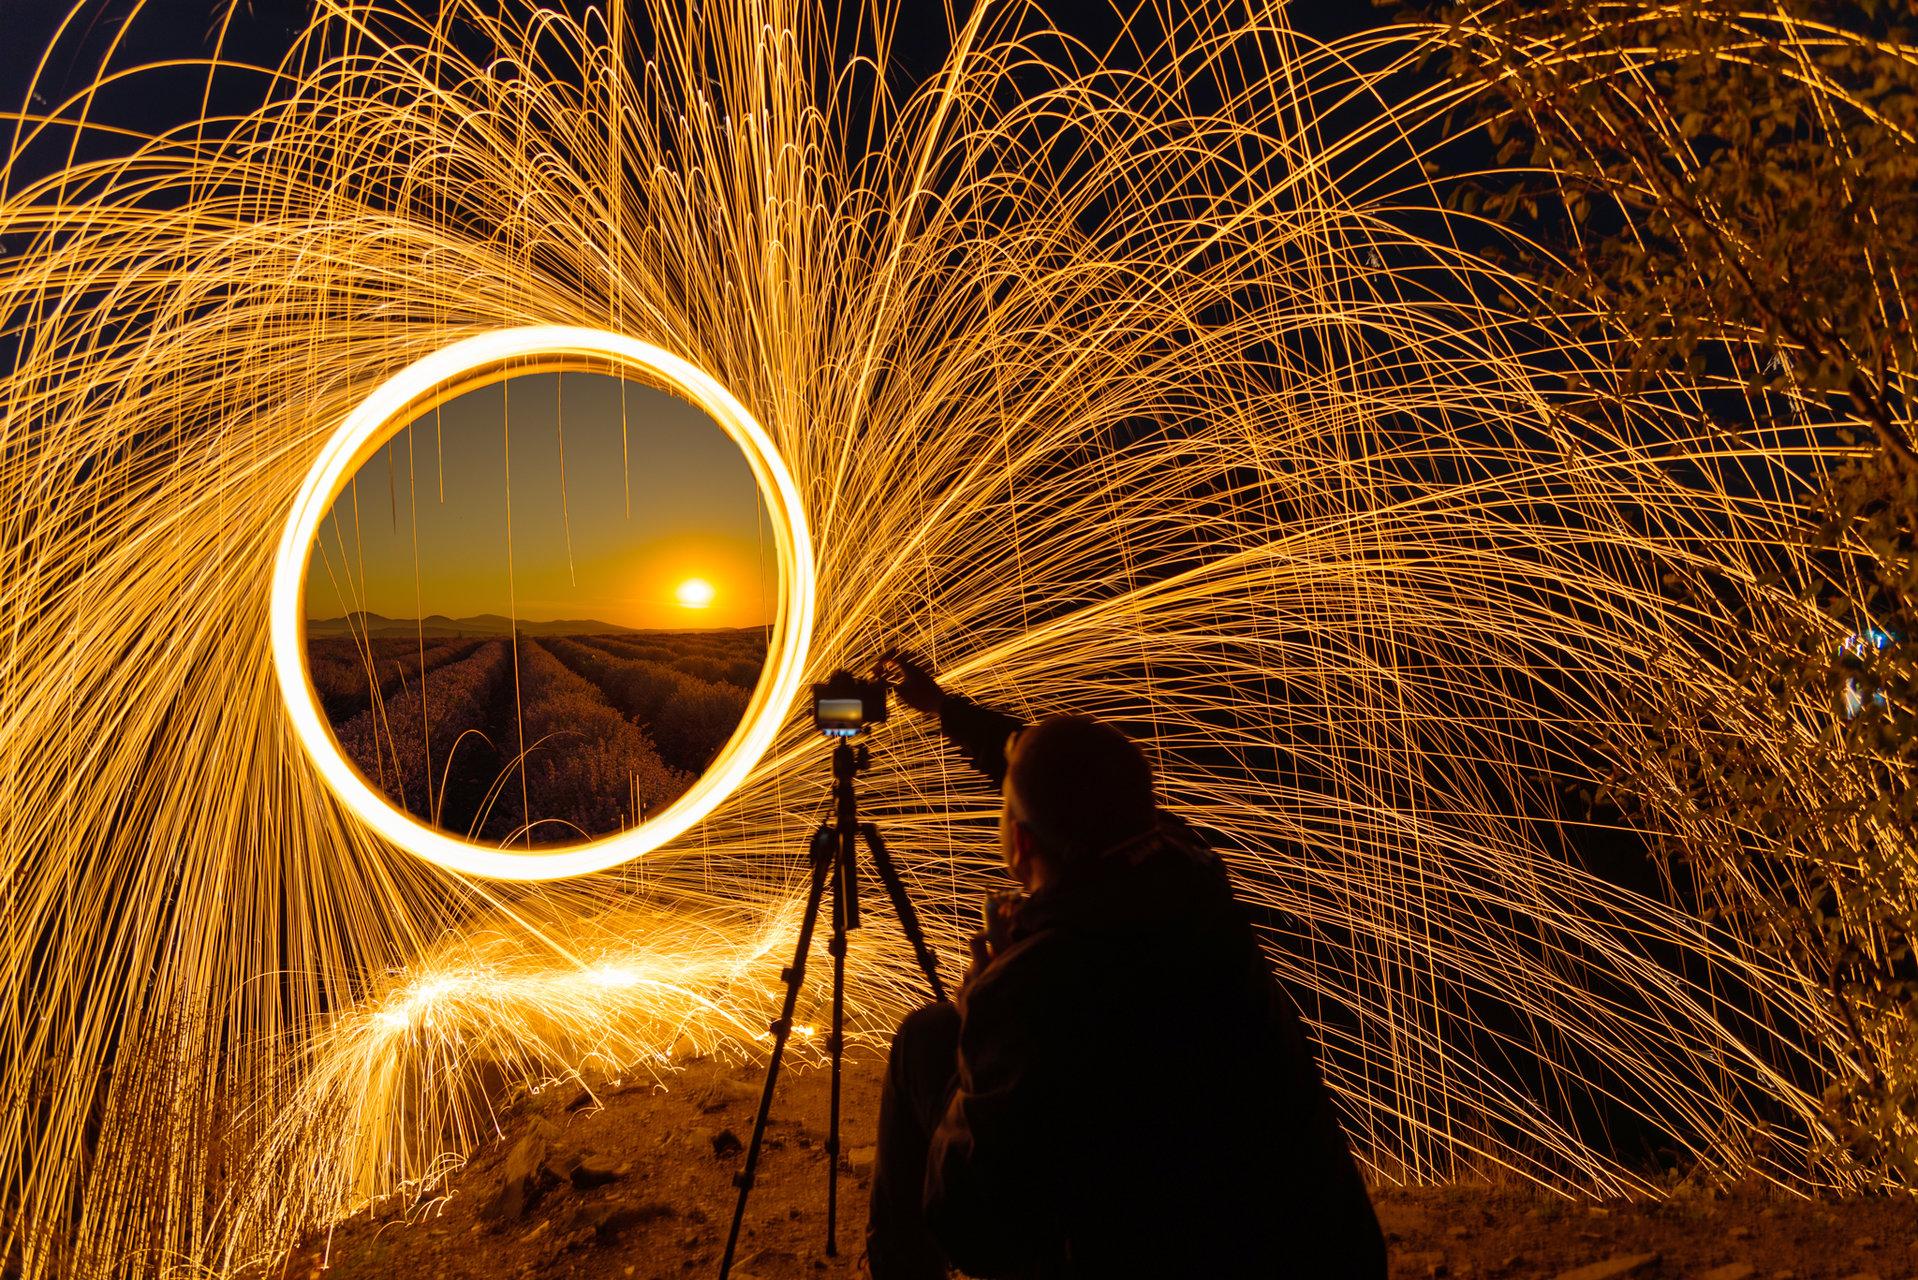 Photo in Experiment | Author Tonev88 | PHOTO FORUM